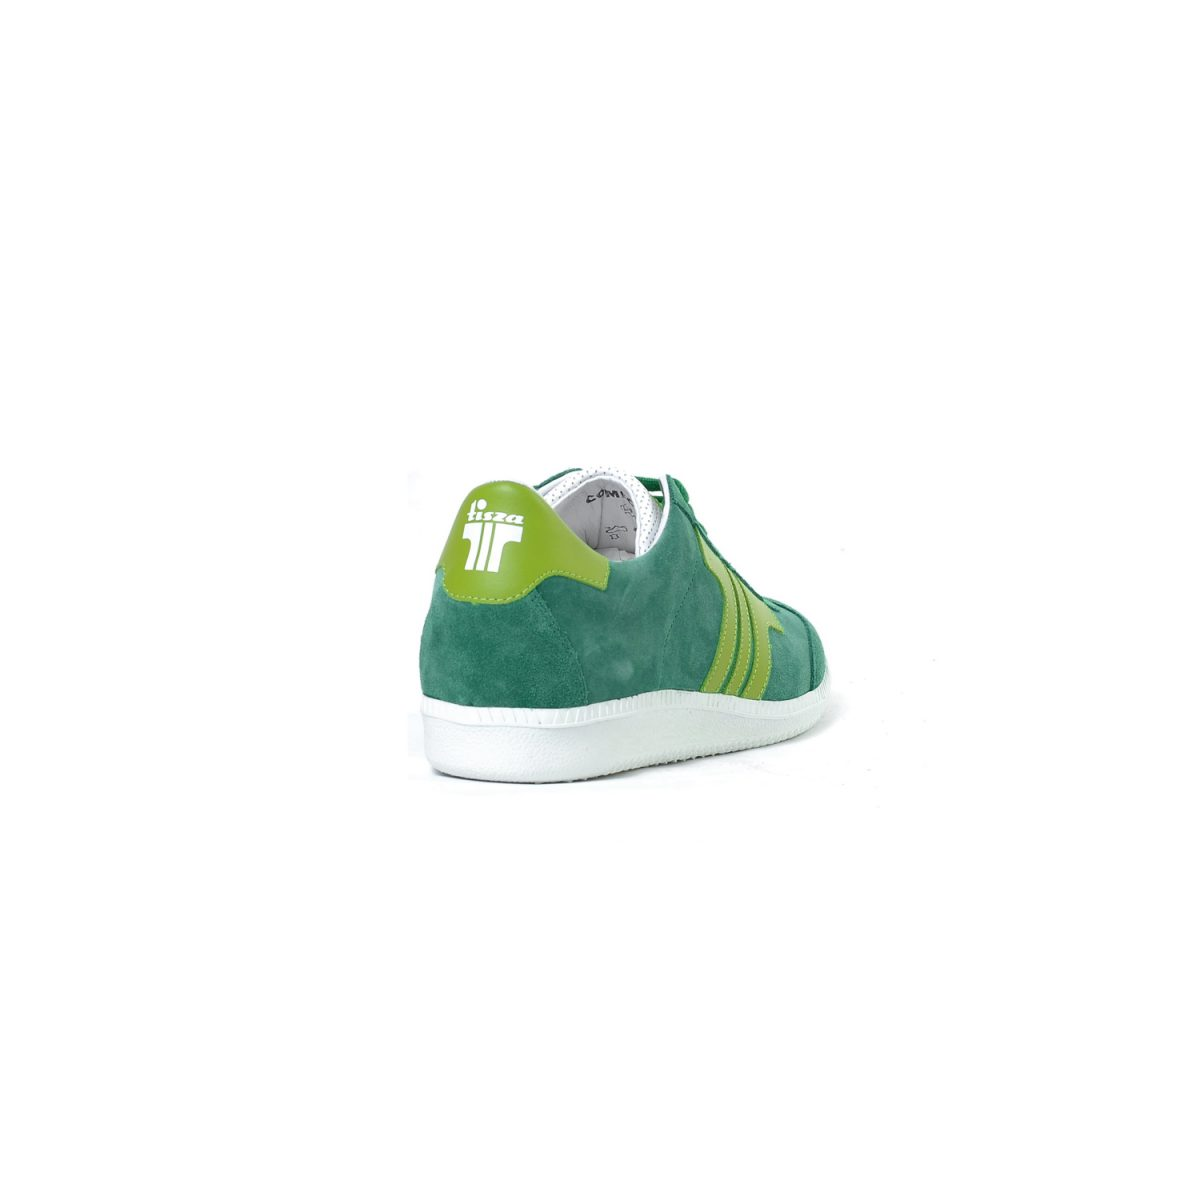 Tisza cipő - Comfort - Zöld-lime